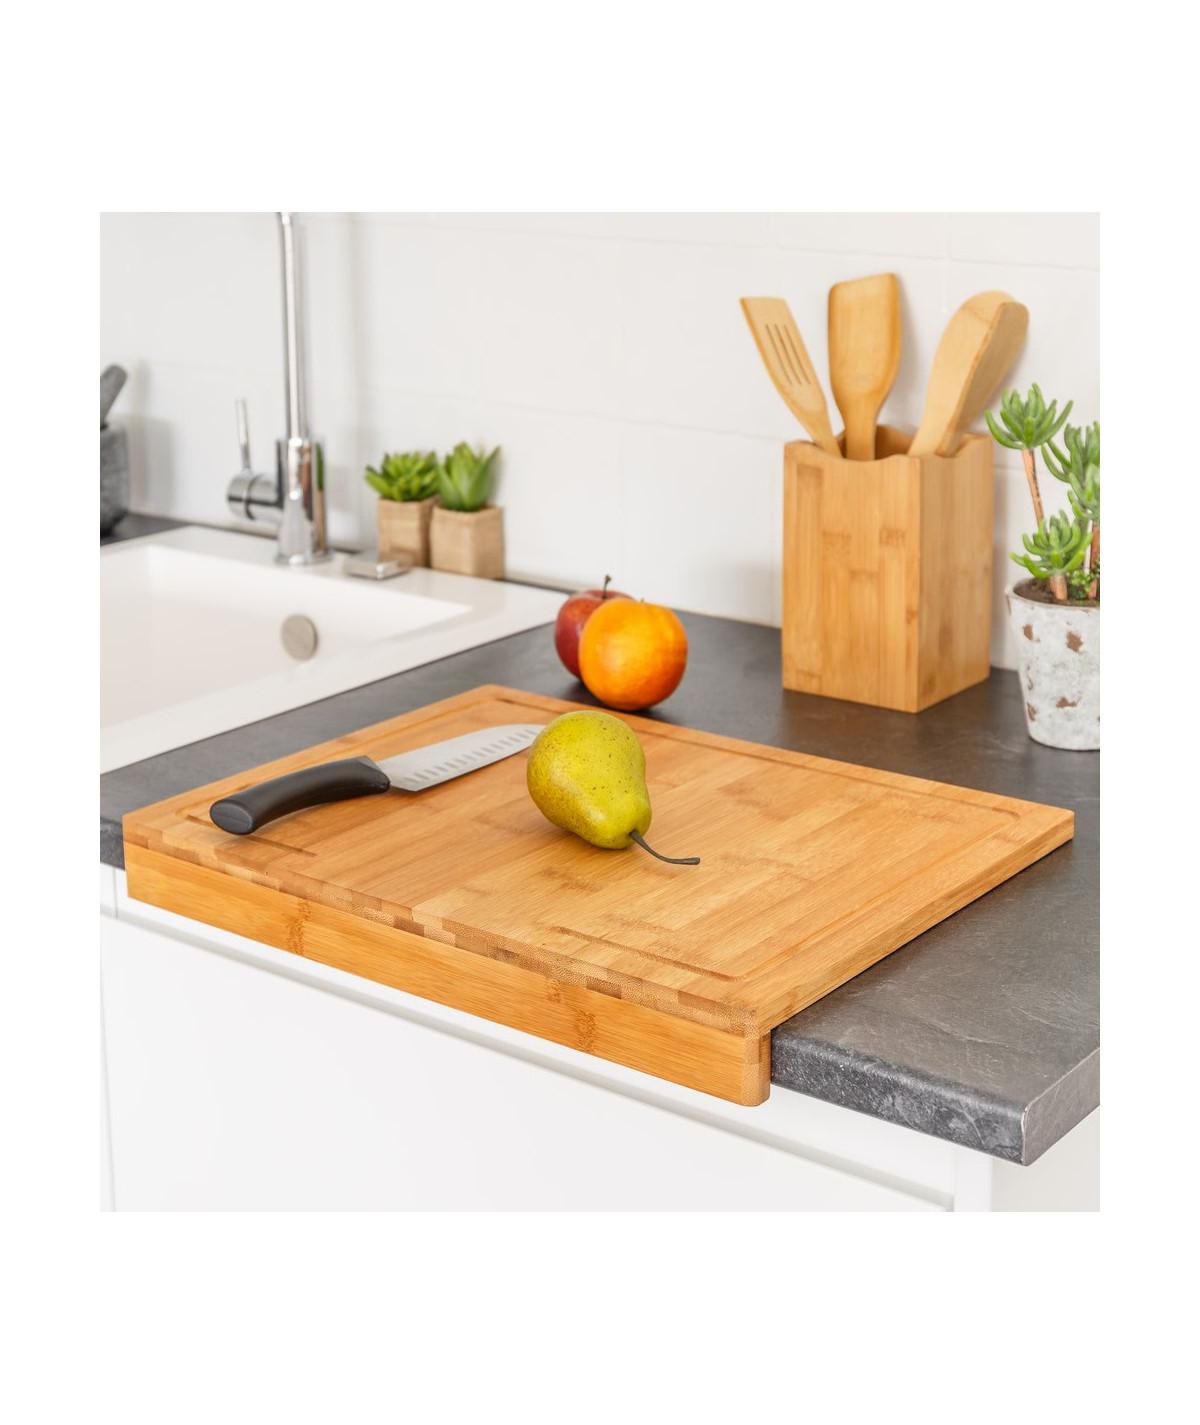 Planche de cuisine en bambou 45x35cm - Plat en bambou | Yesdeko